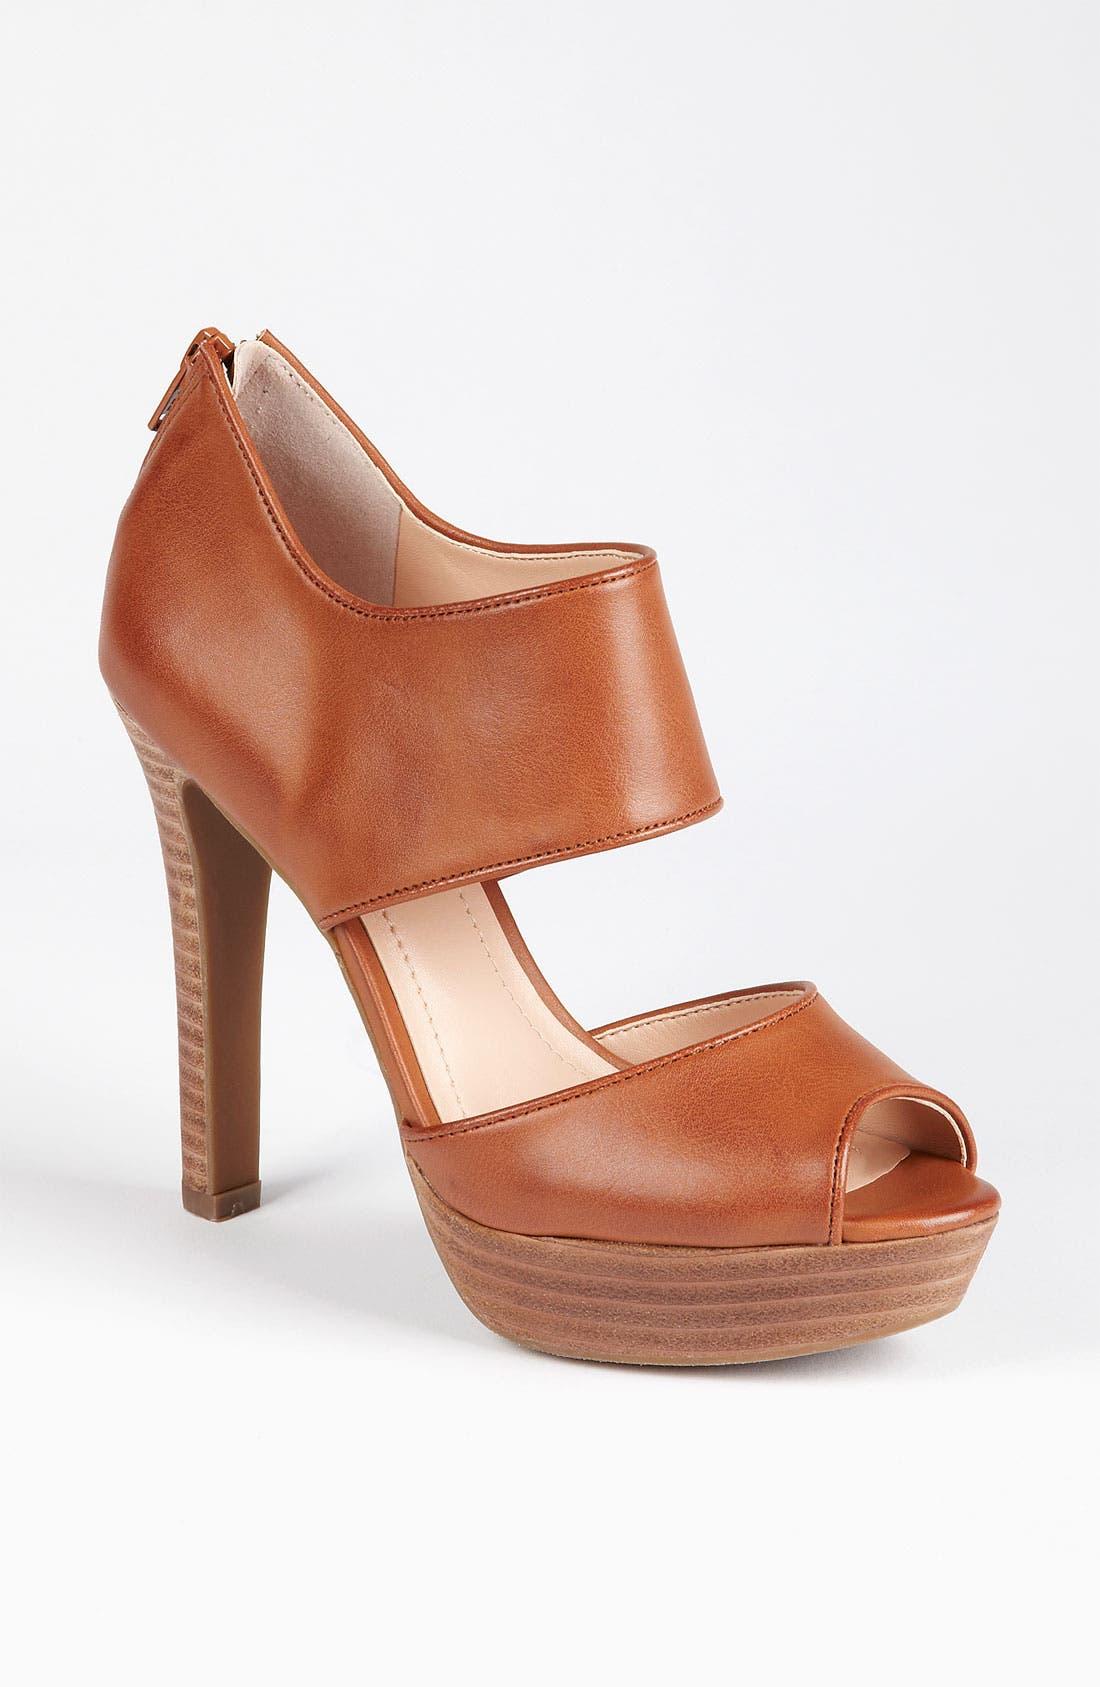 Alternate Image 1 Selected - Sole Society 'Karissa' Sandal